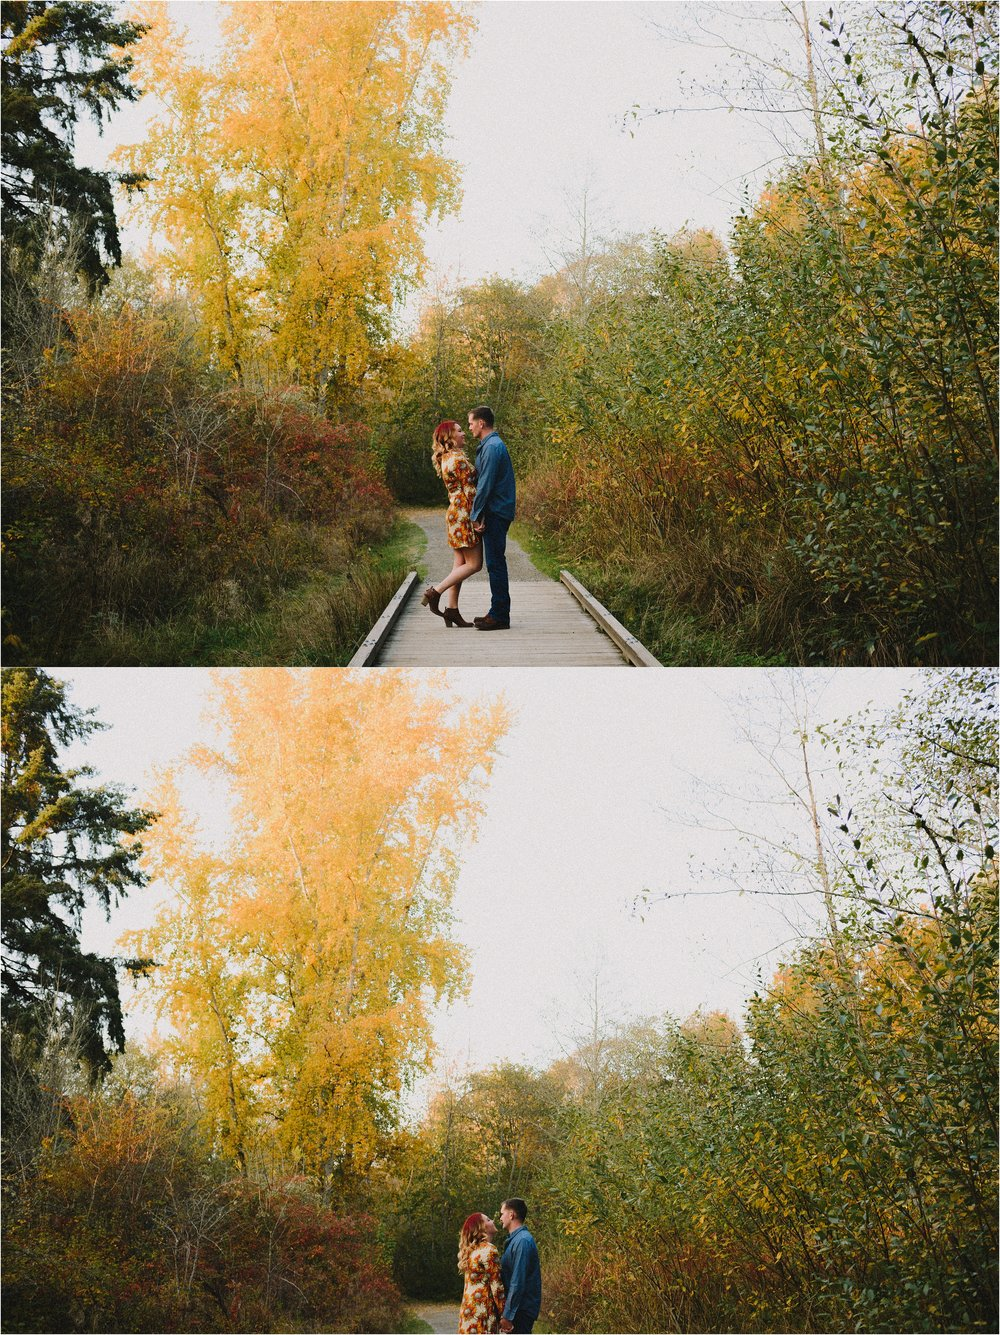 titlow-beach-park-engagement-session-jannicka-mayte-anchorage-alaska-wedding-photographer_0013.jpg